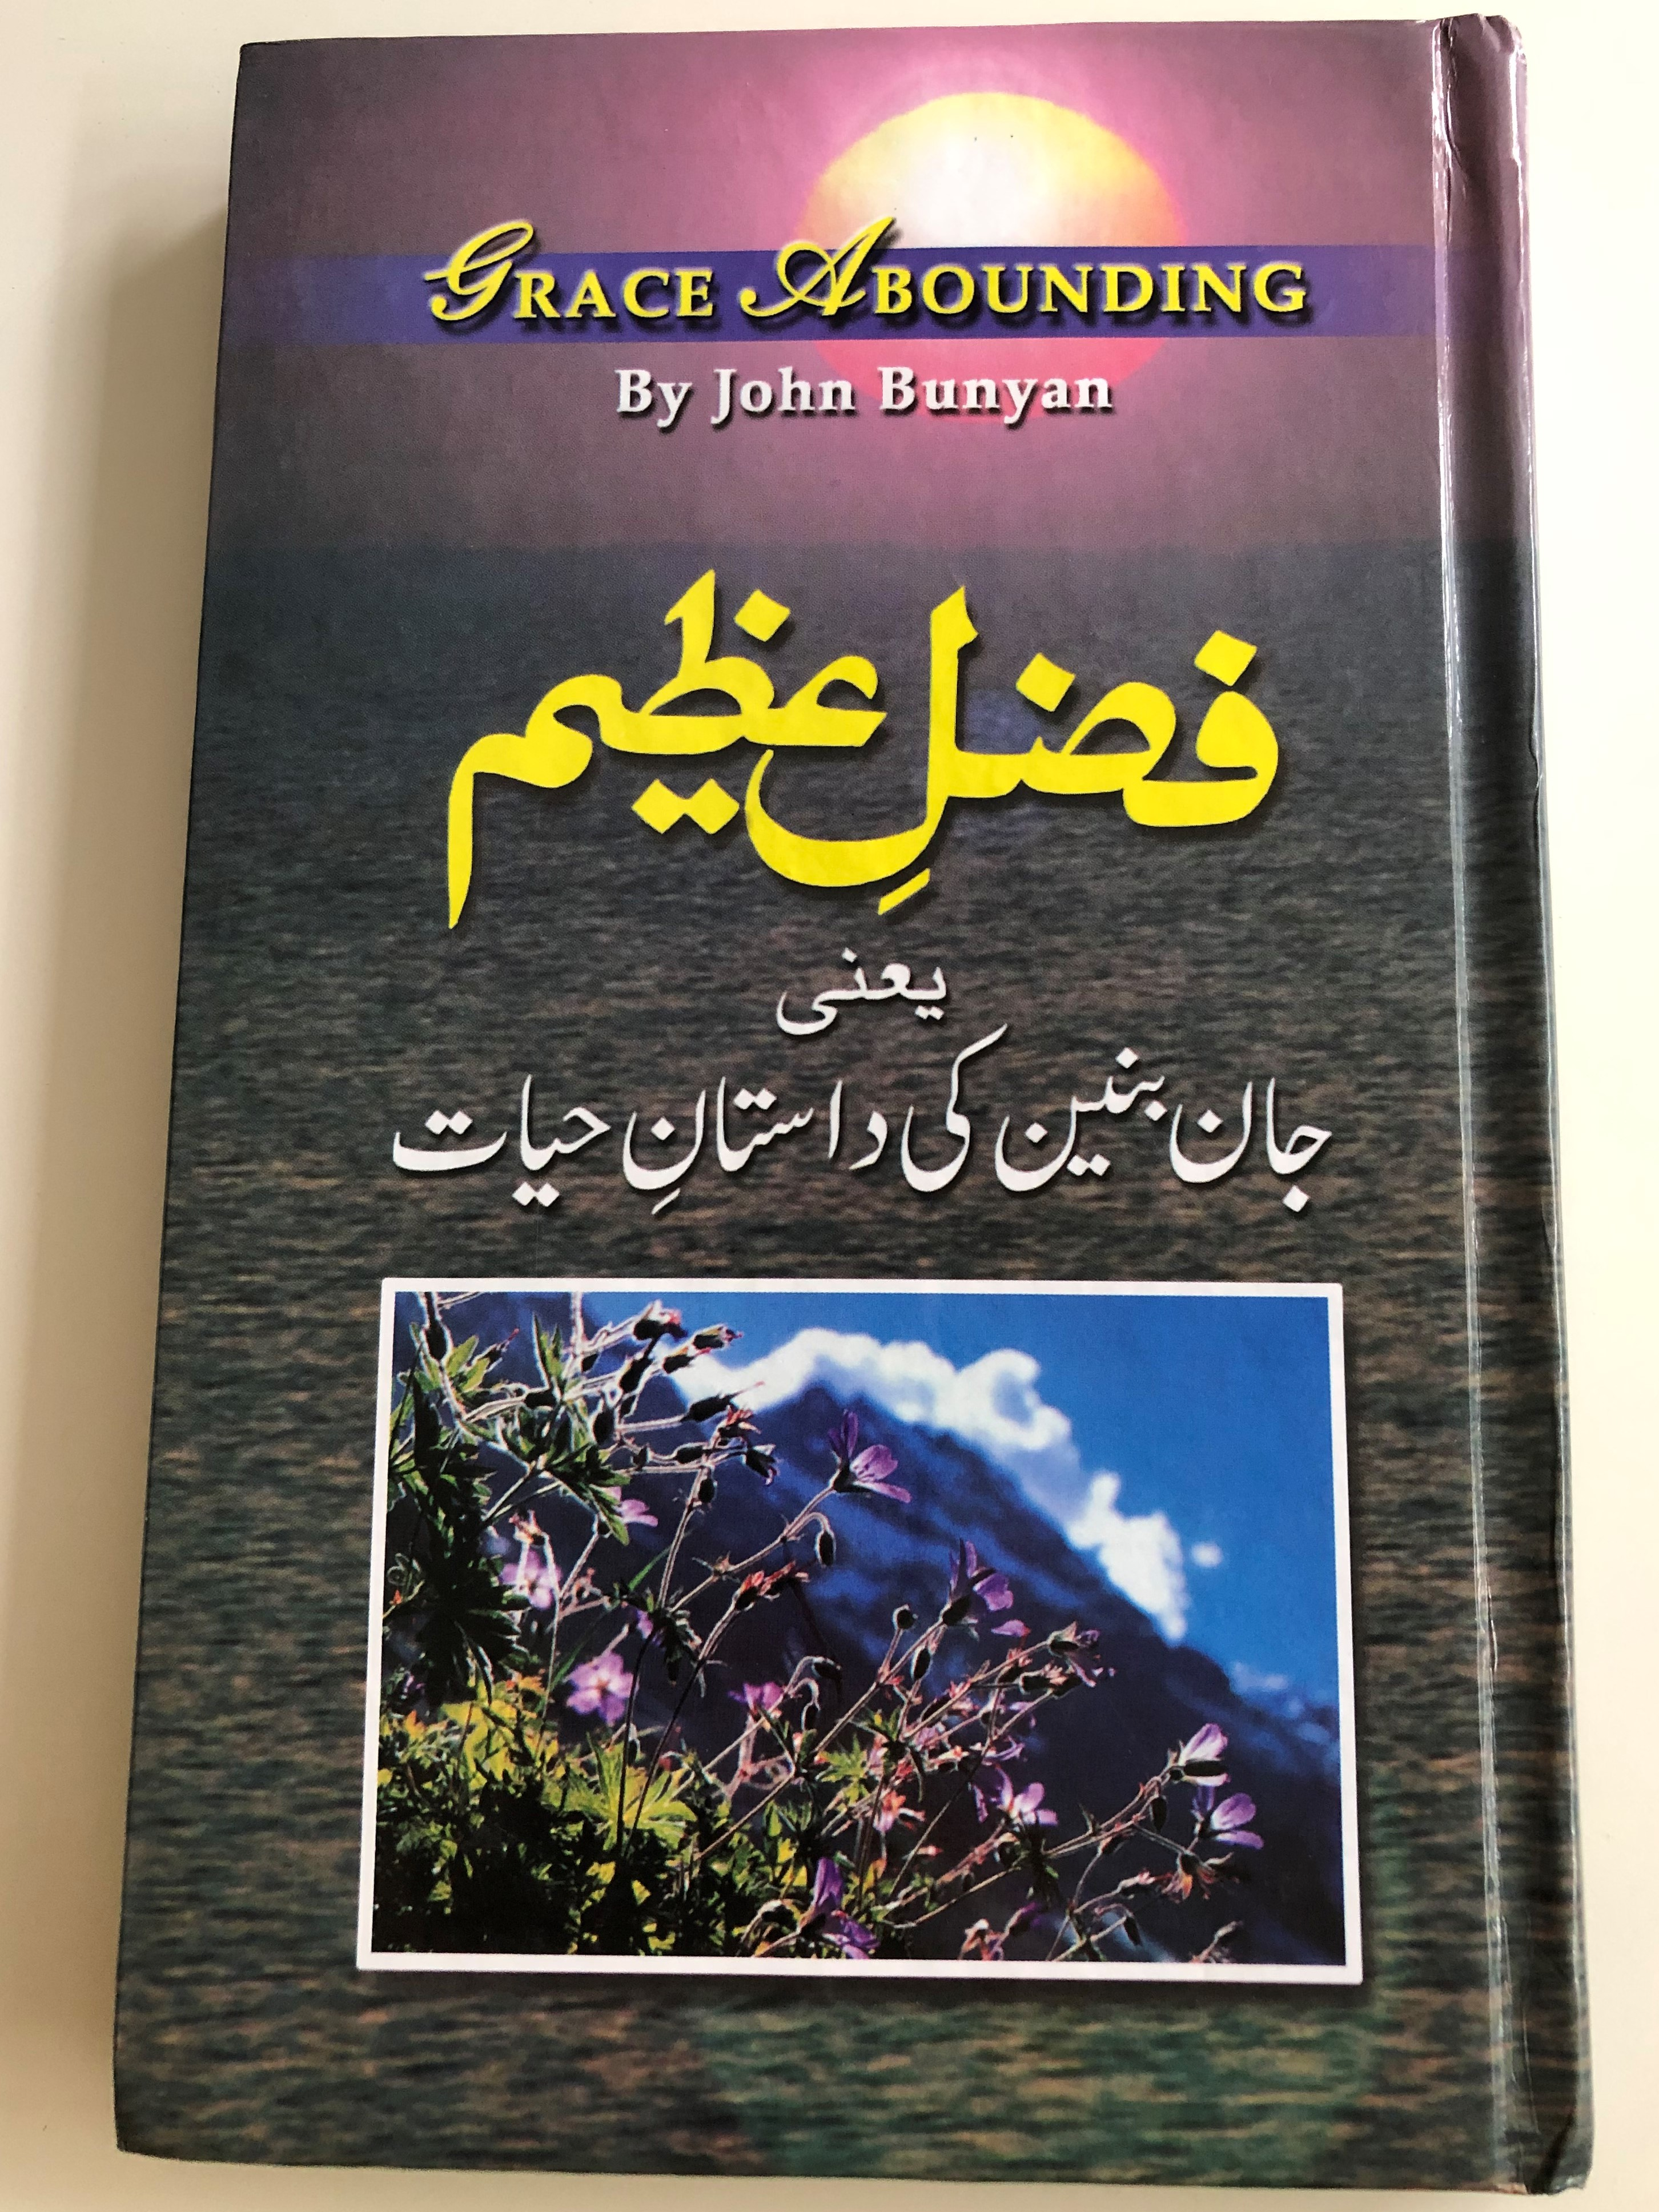 grace-abounding-by-john-bunyan-in-urdu-language-hardcover-grace-abounding-to-the-chief-of-sinners-spiritual-autobiography-of-bunyan-1-.jpg